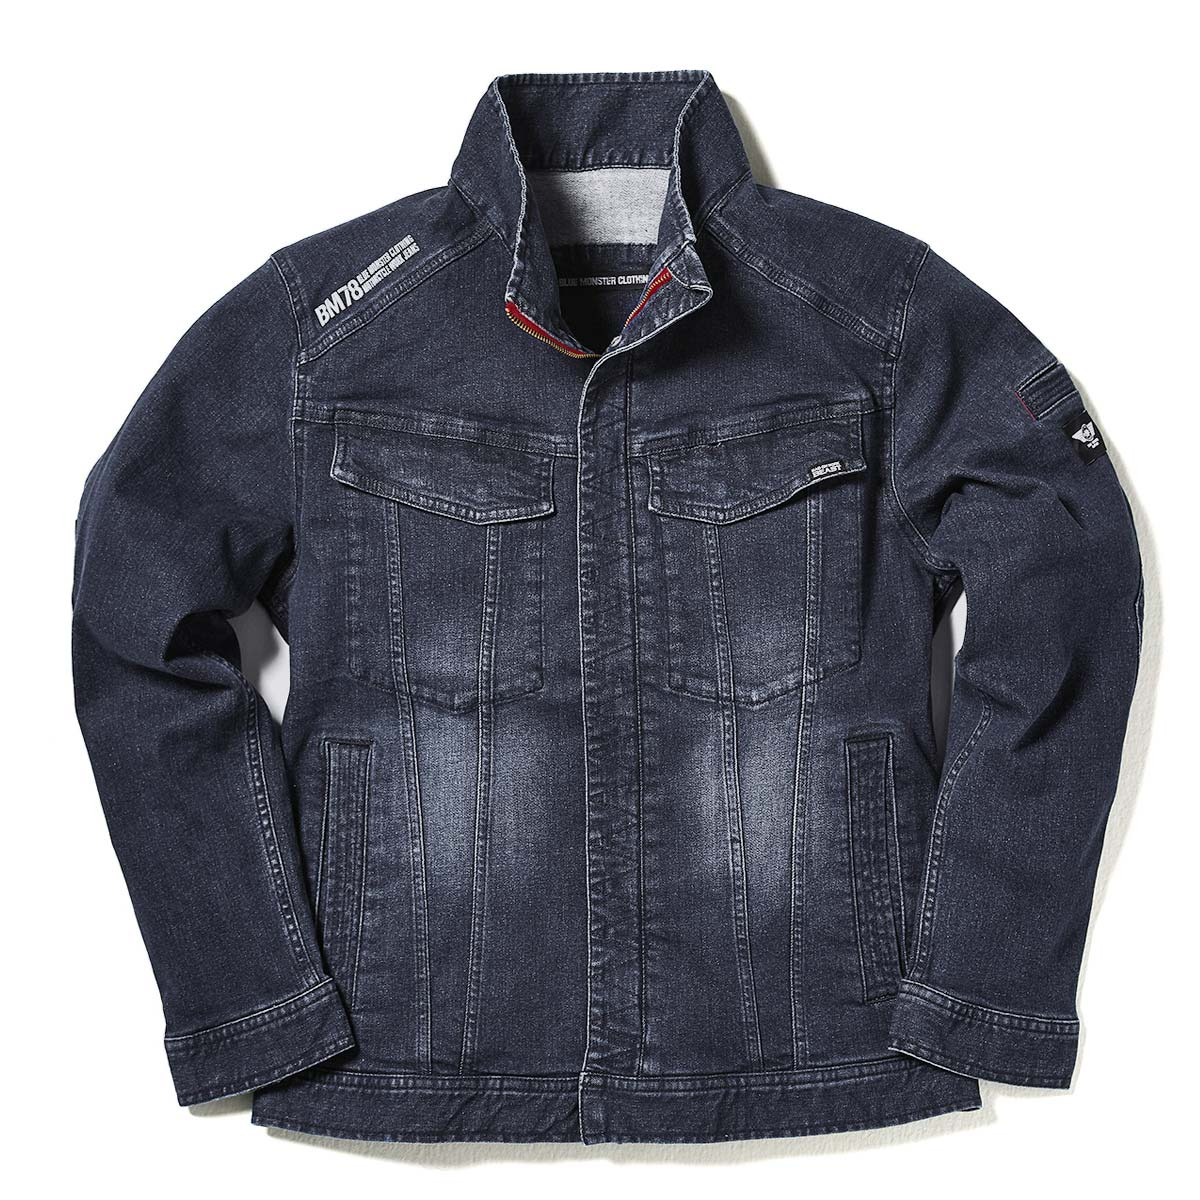 427048665e9 Joke big size cord blue   cord navy M-3L where work jacket stretch denim men  MWB BM78 Urban third jacket riders jacket   denim jacket   work jacket  working ...